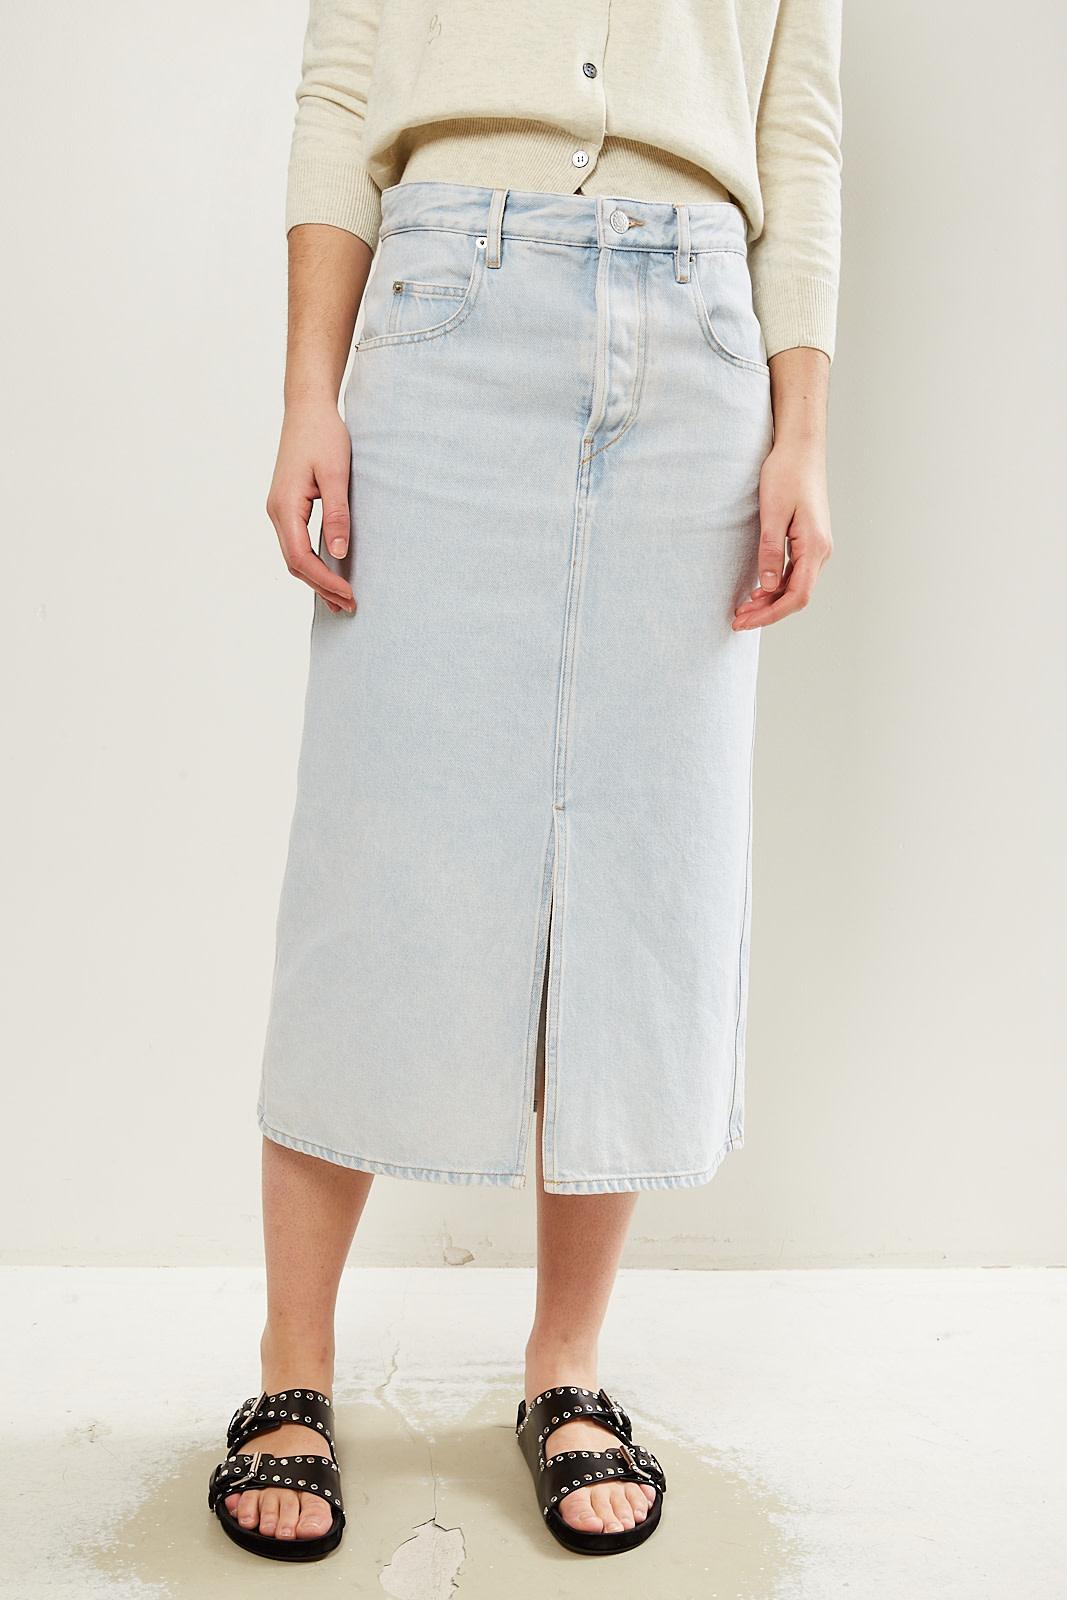 Etoile Isabel Marant Laurina jeans skirt